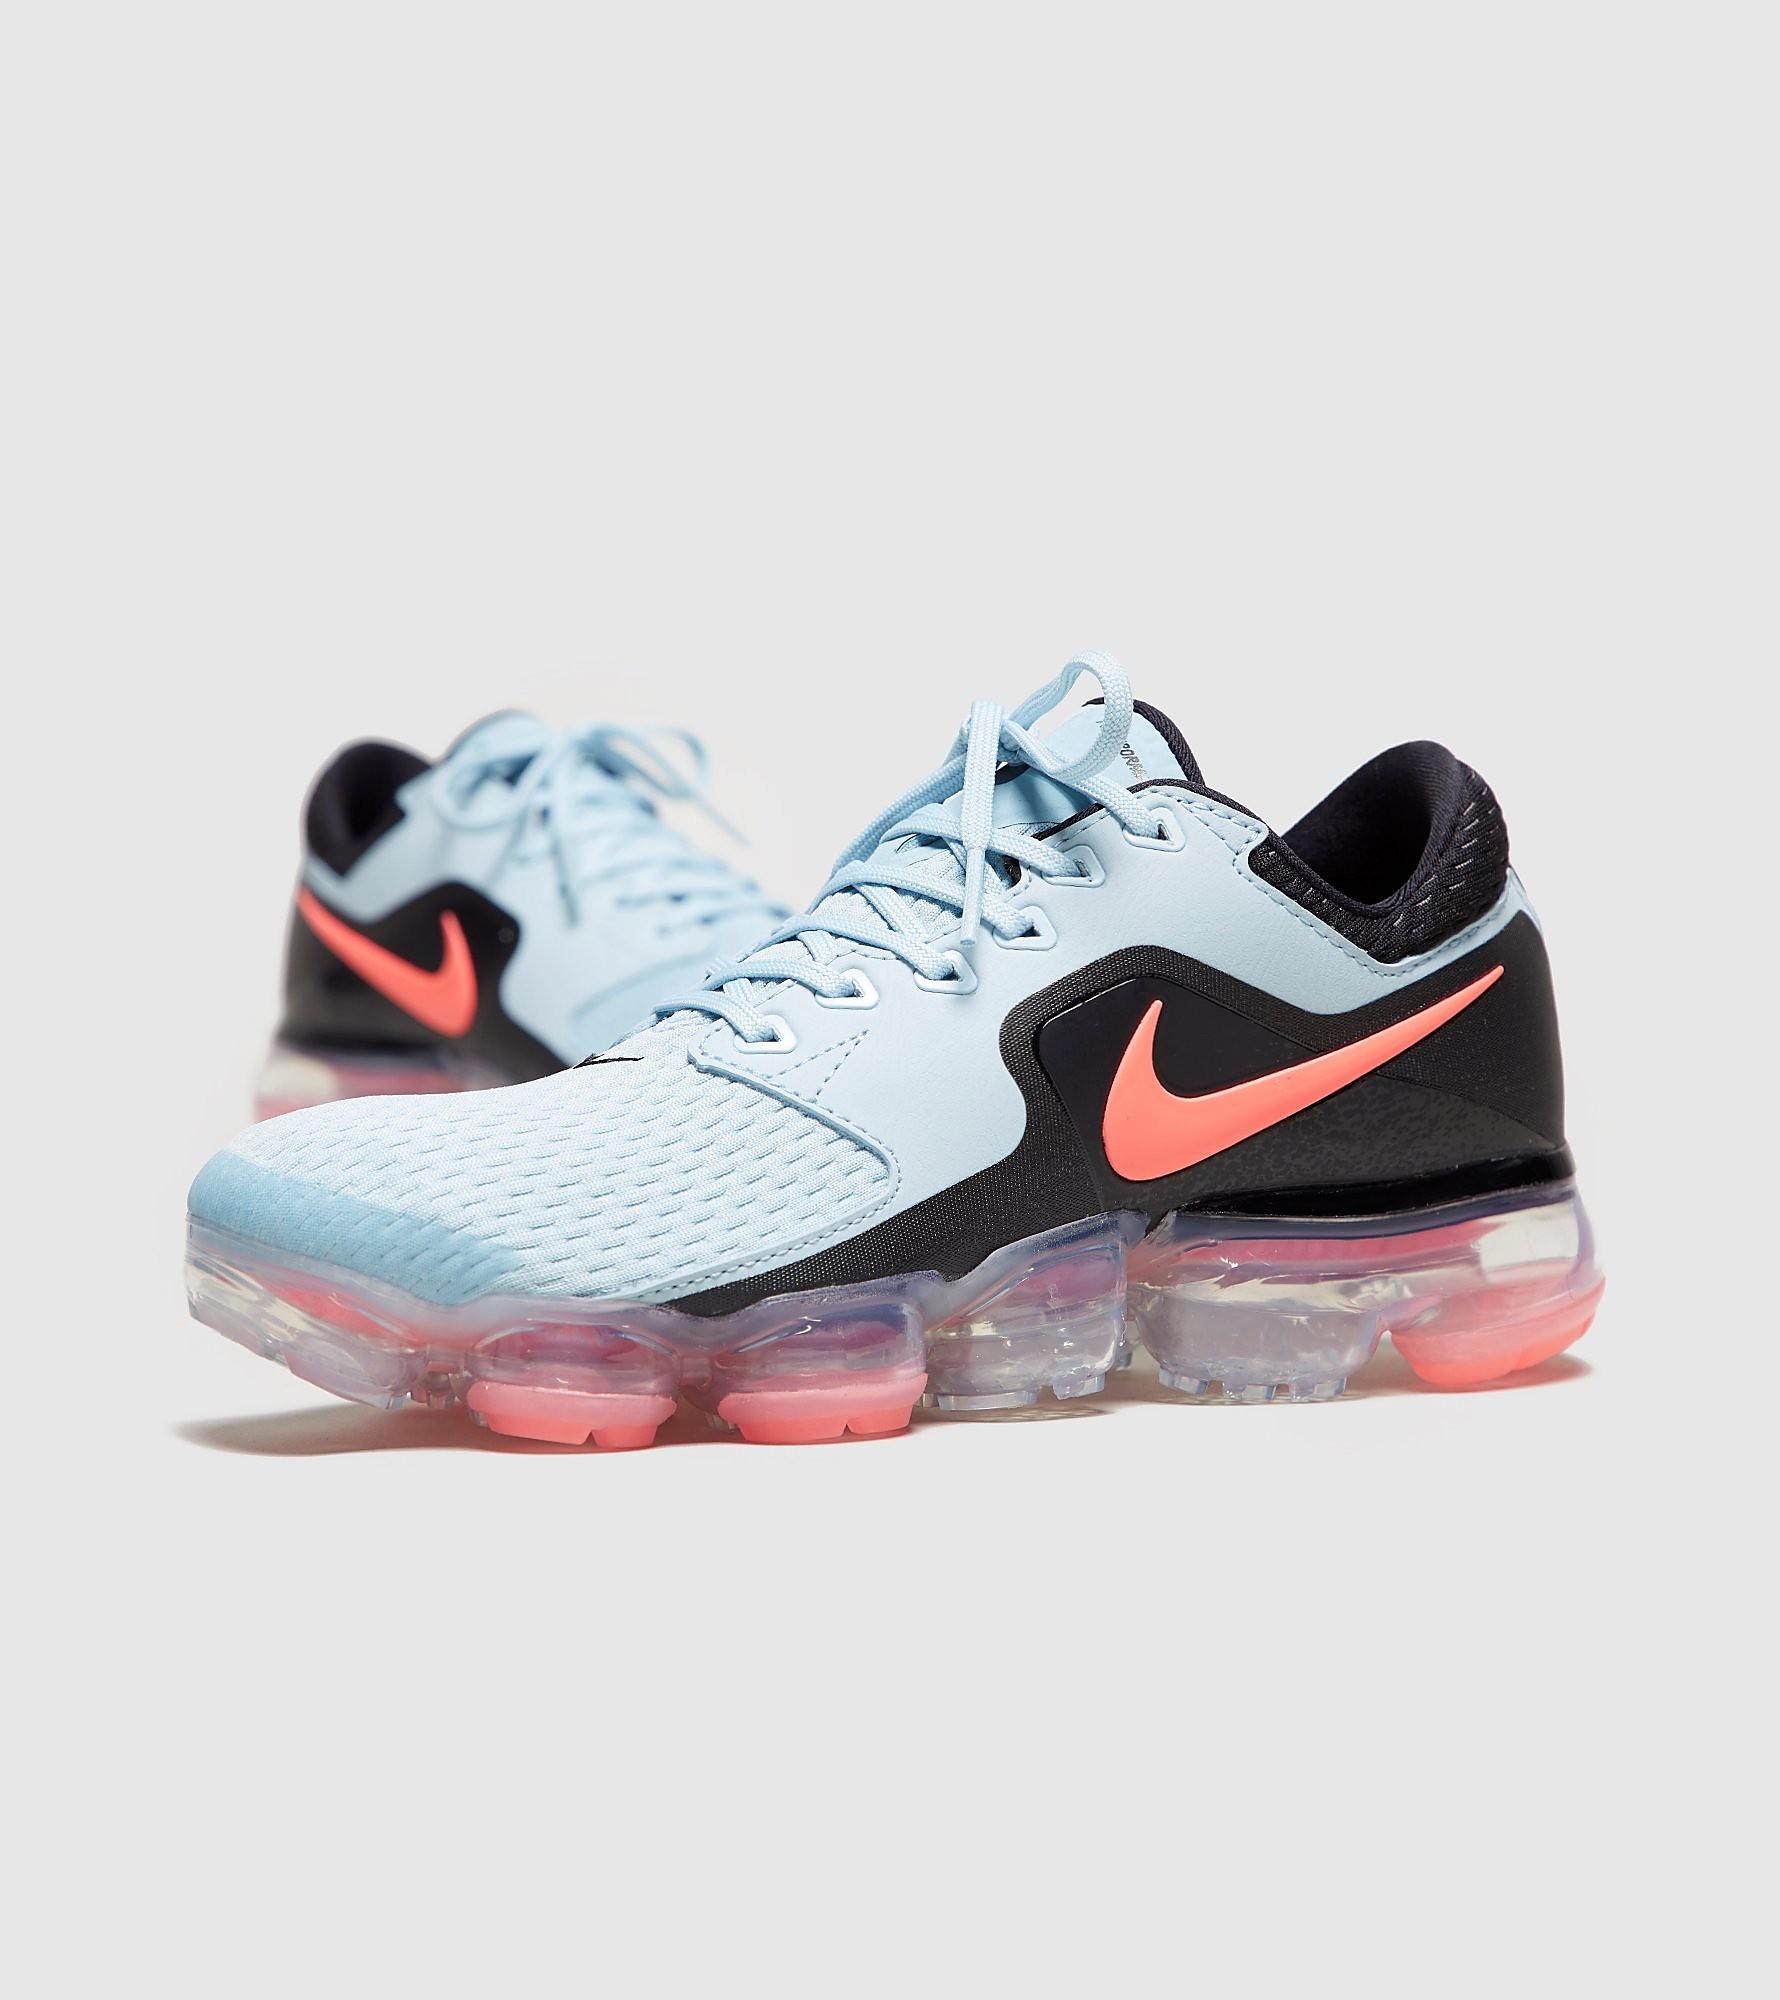 Nike Air VaporMax Women's